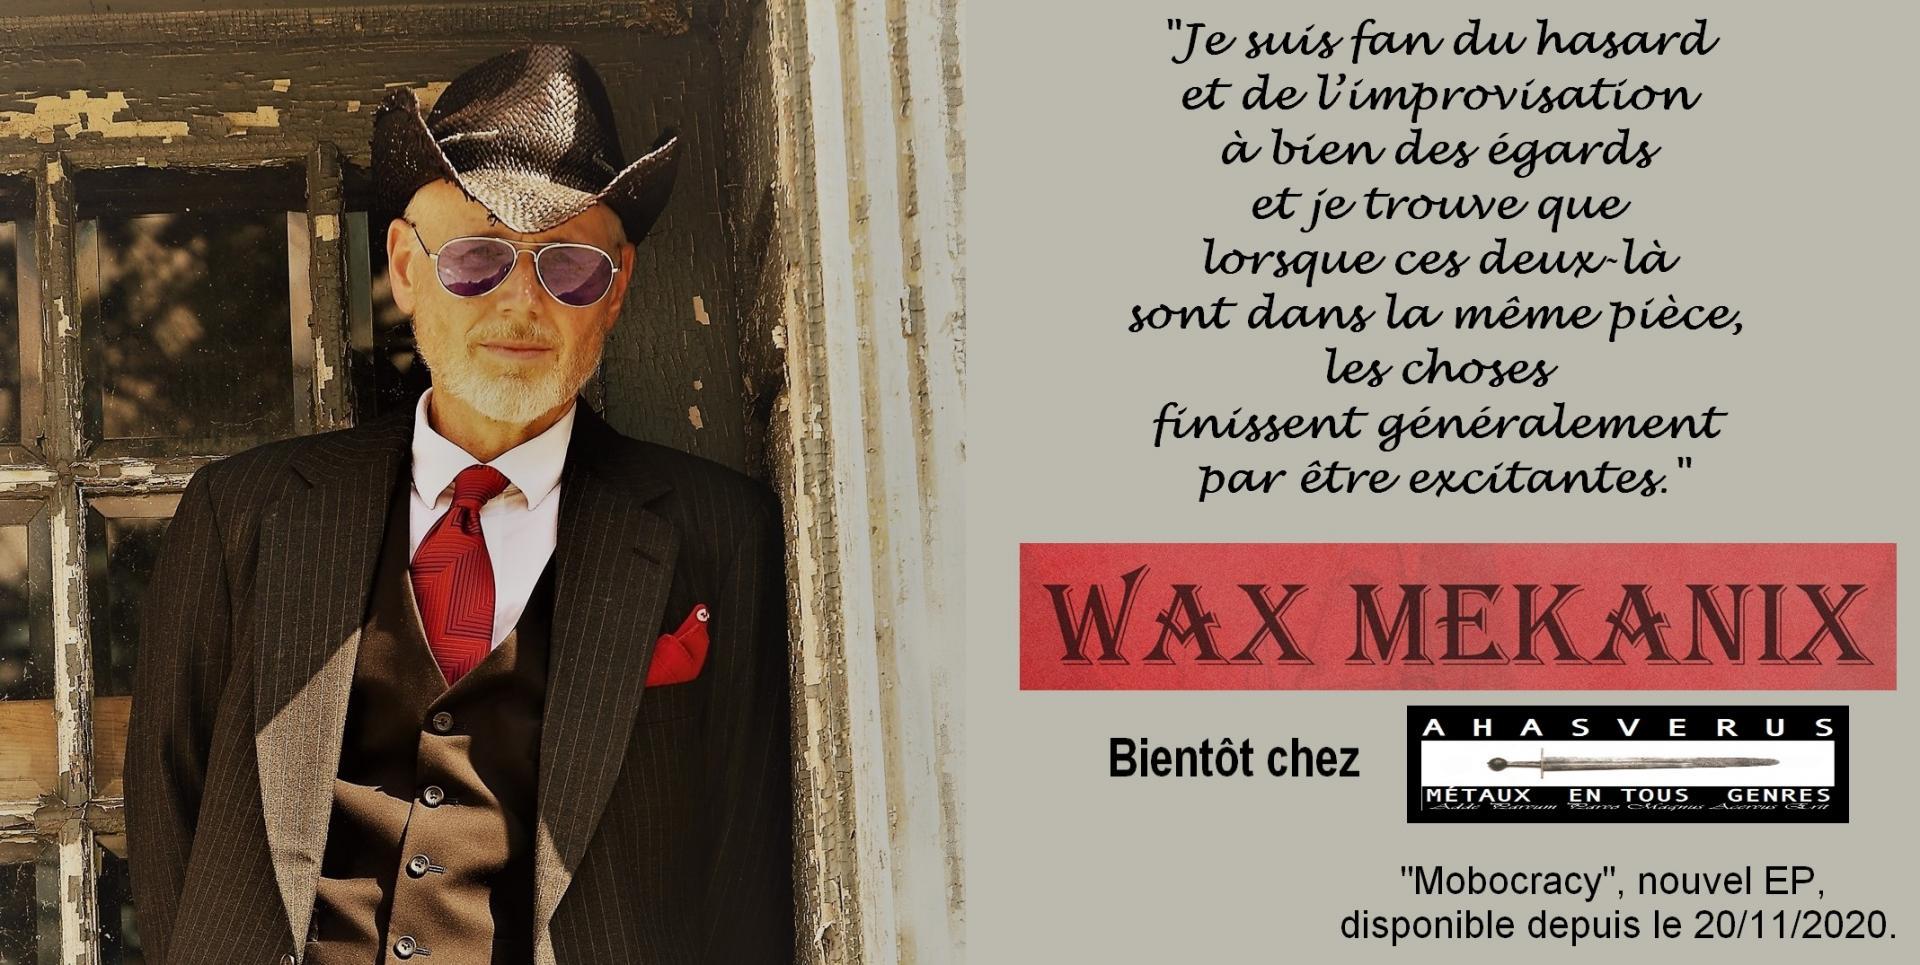 WAX MEKANIX (USA - Rock/Hard), La mobocracie dans le texte (interview)